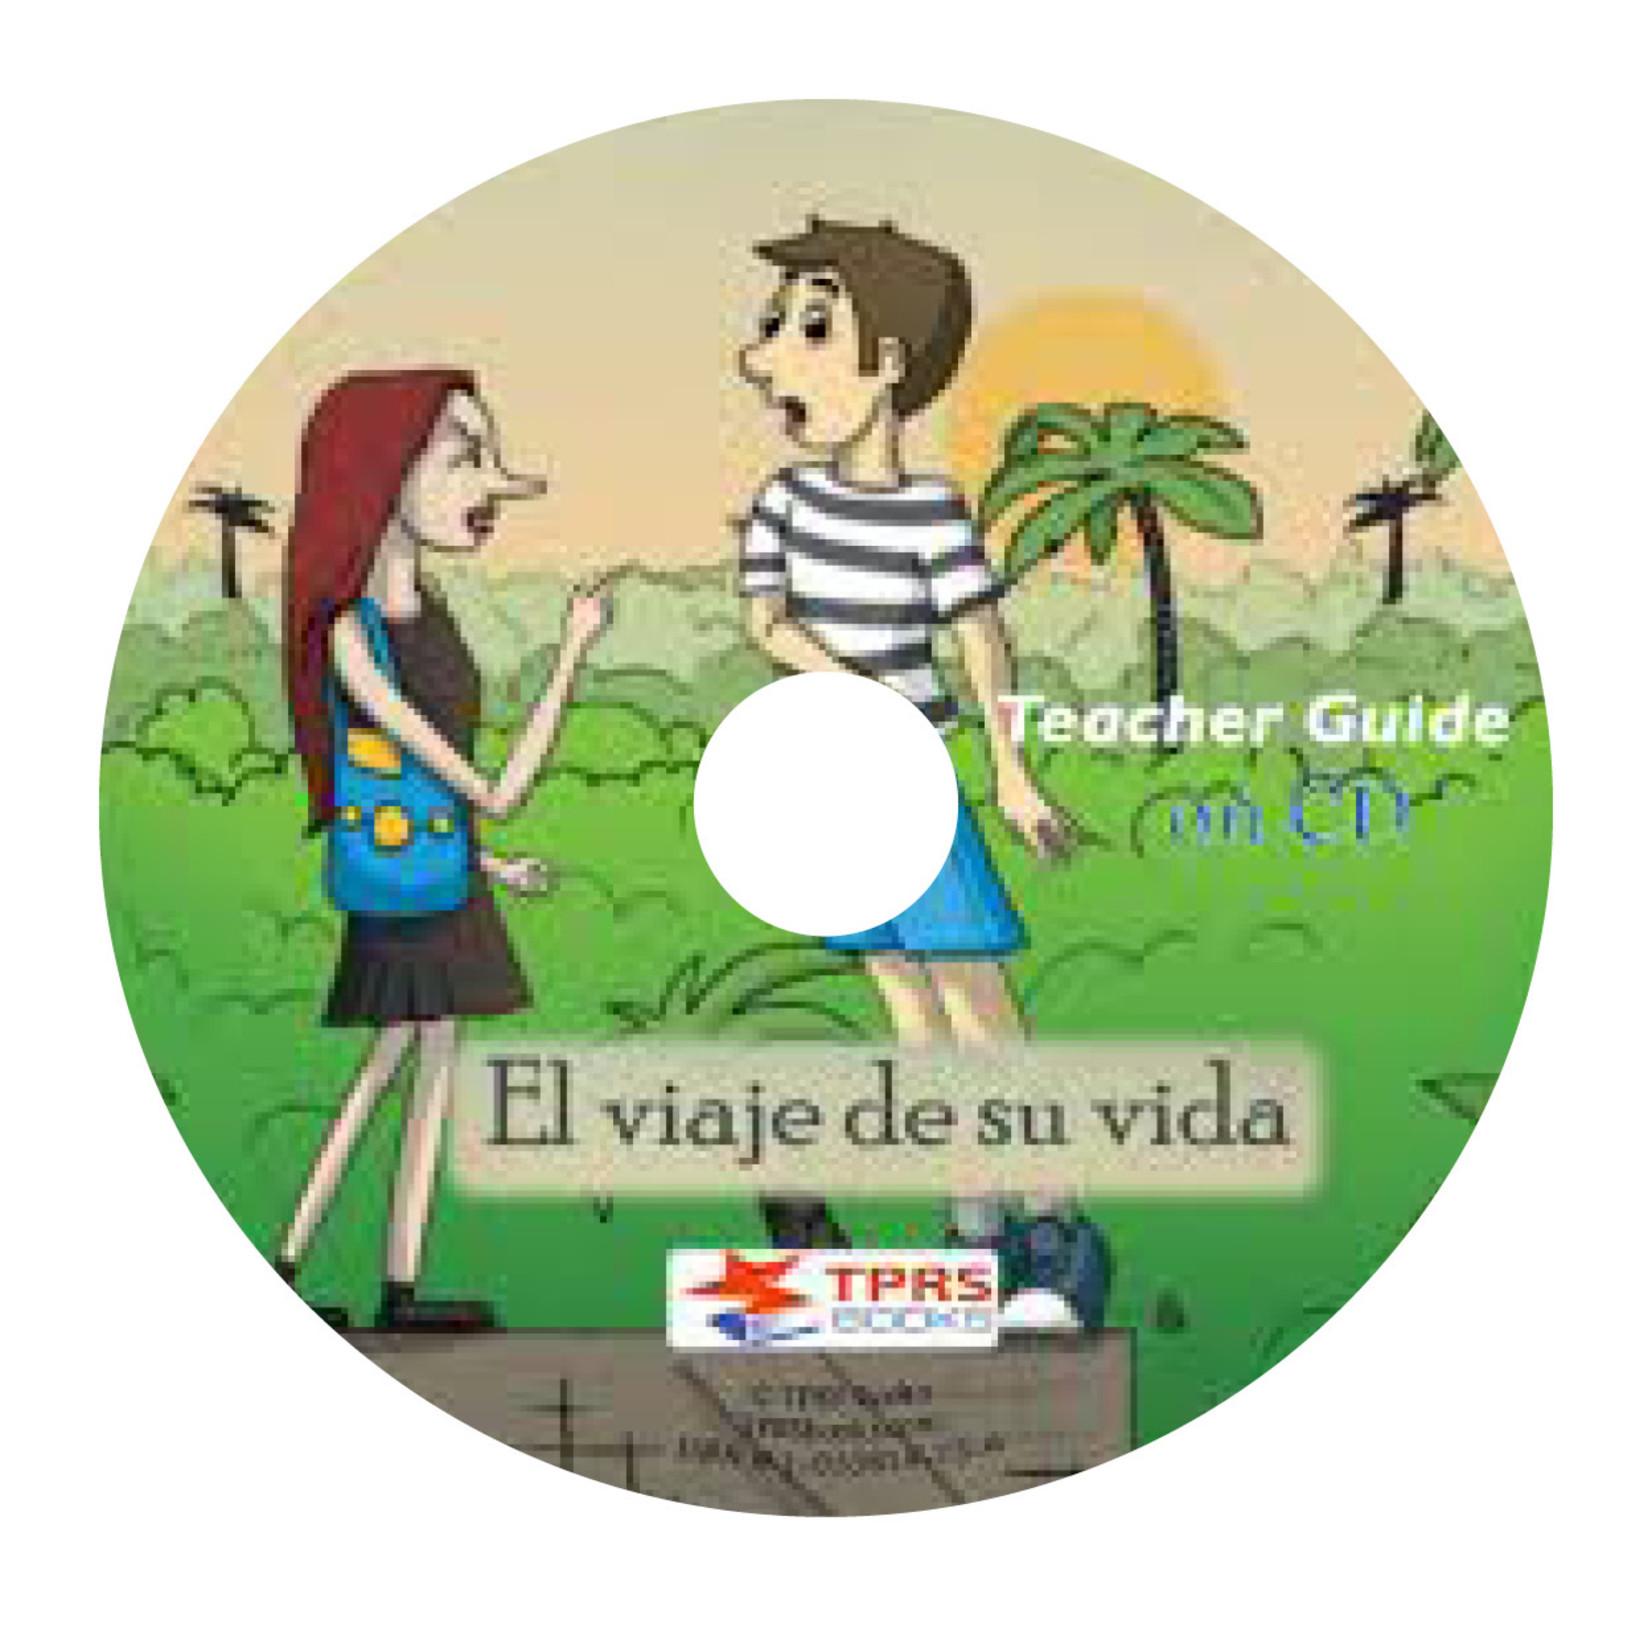 TPRS Books El viaje de su vida - Teacher'sGuide